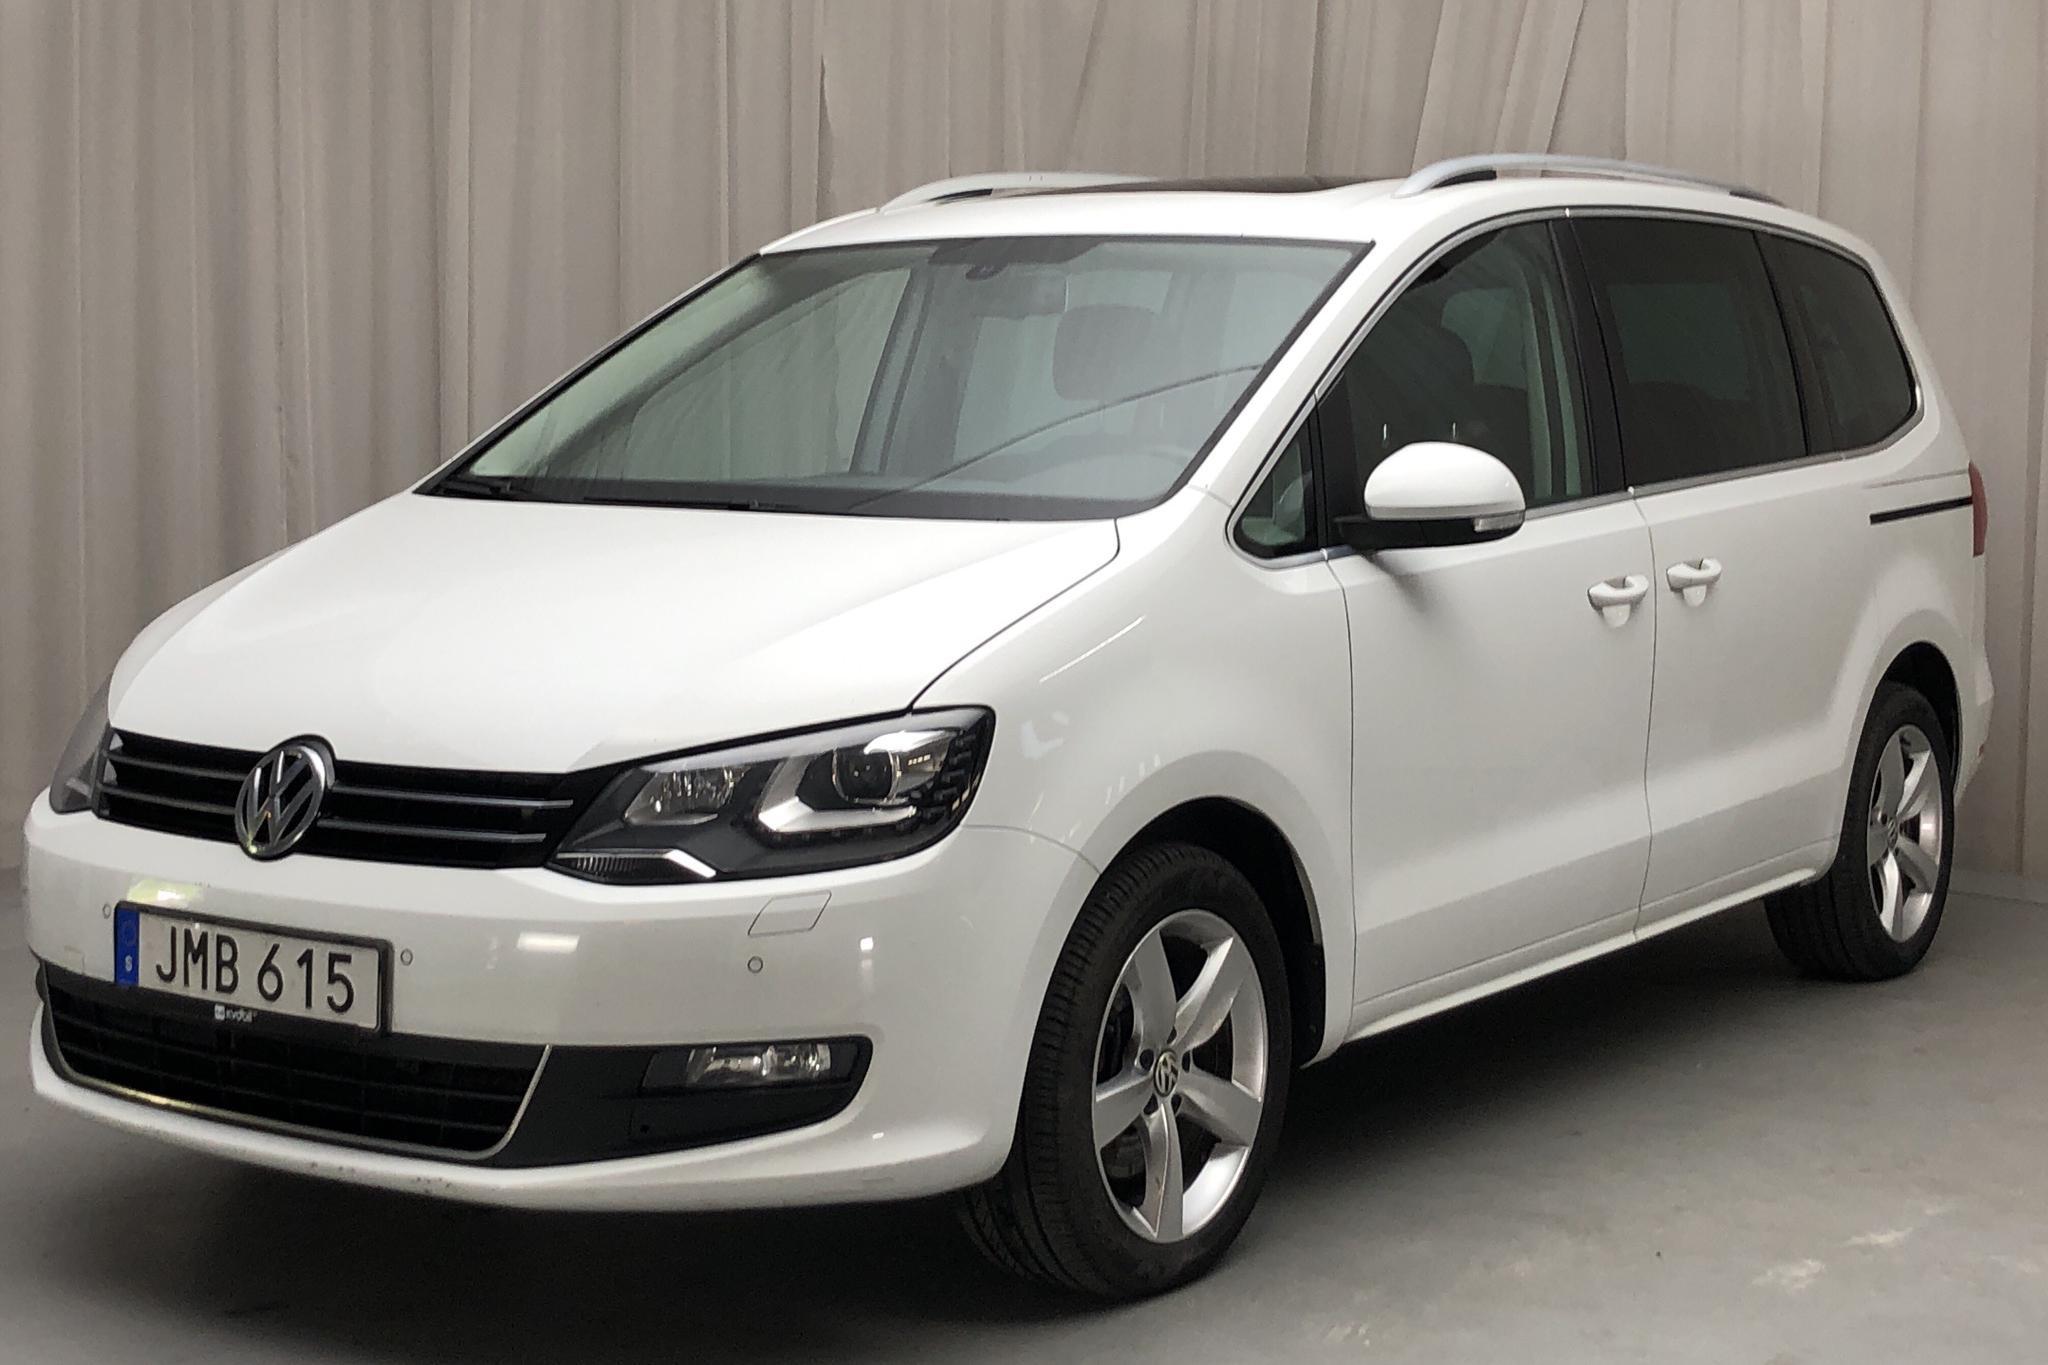 VW Sharan 2.0 TDI BlueMotion Technology 4motion (140hk) - 149 190 km - Manual - white - 2015